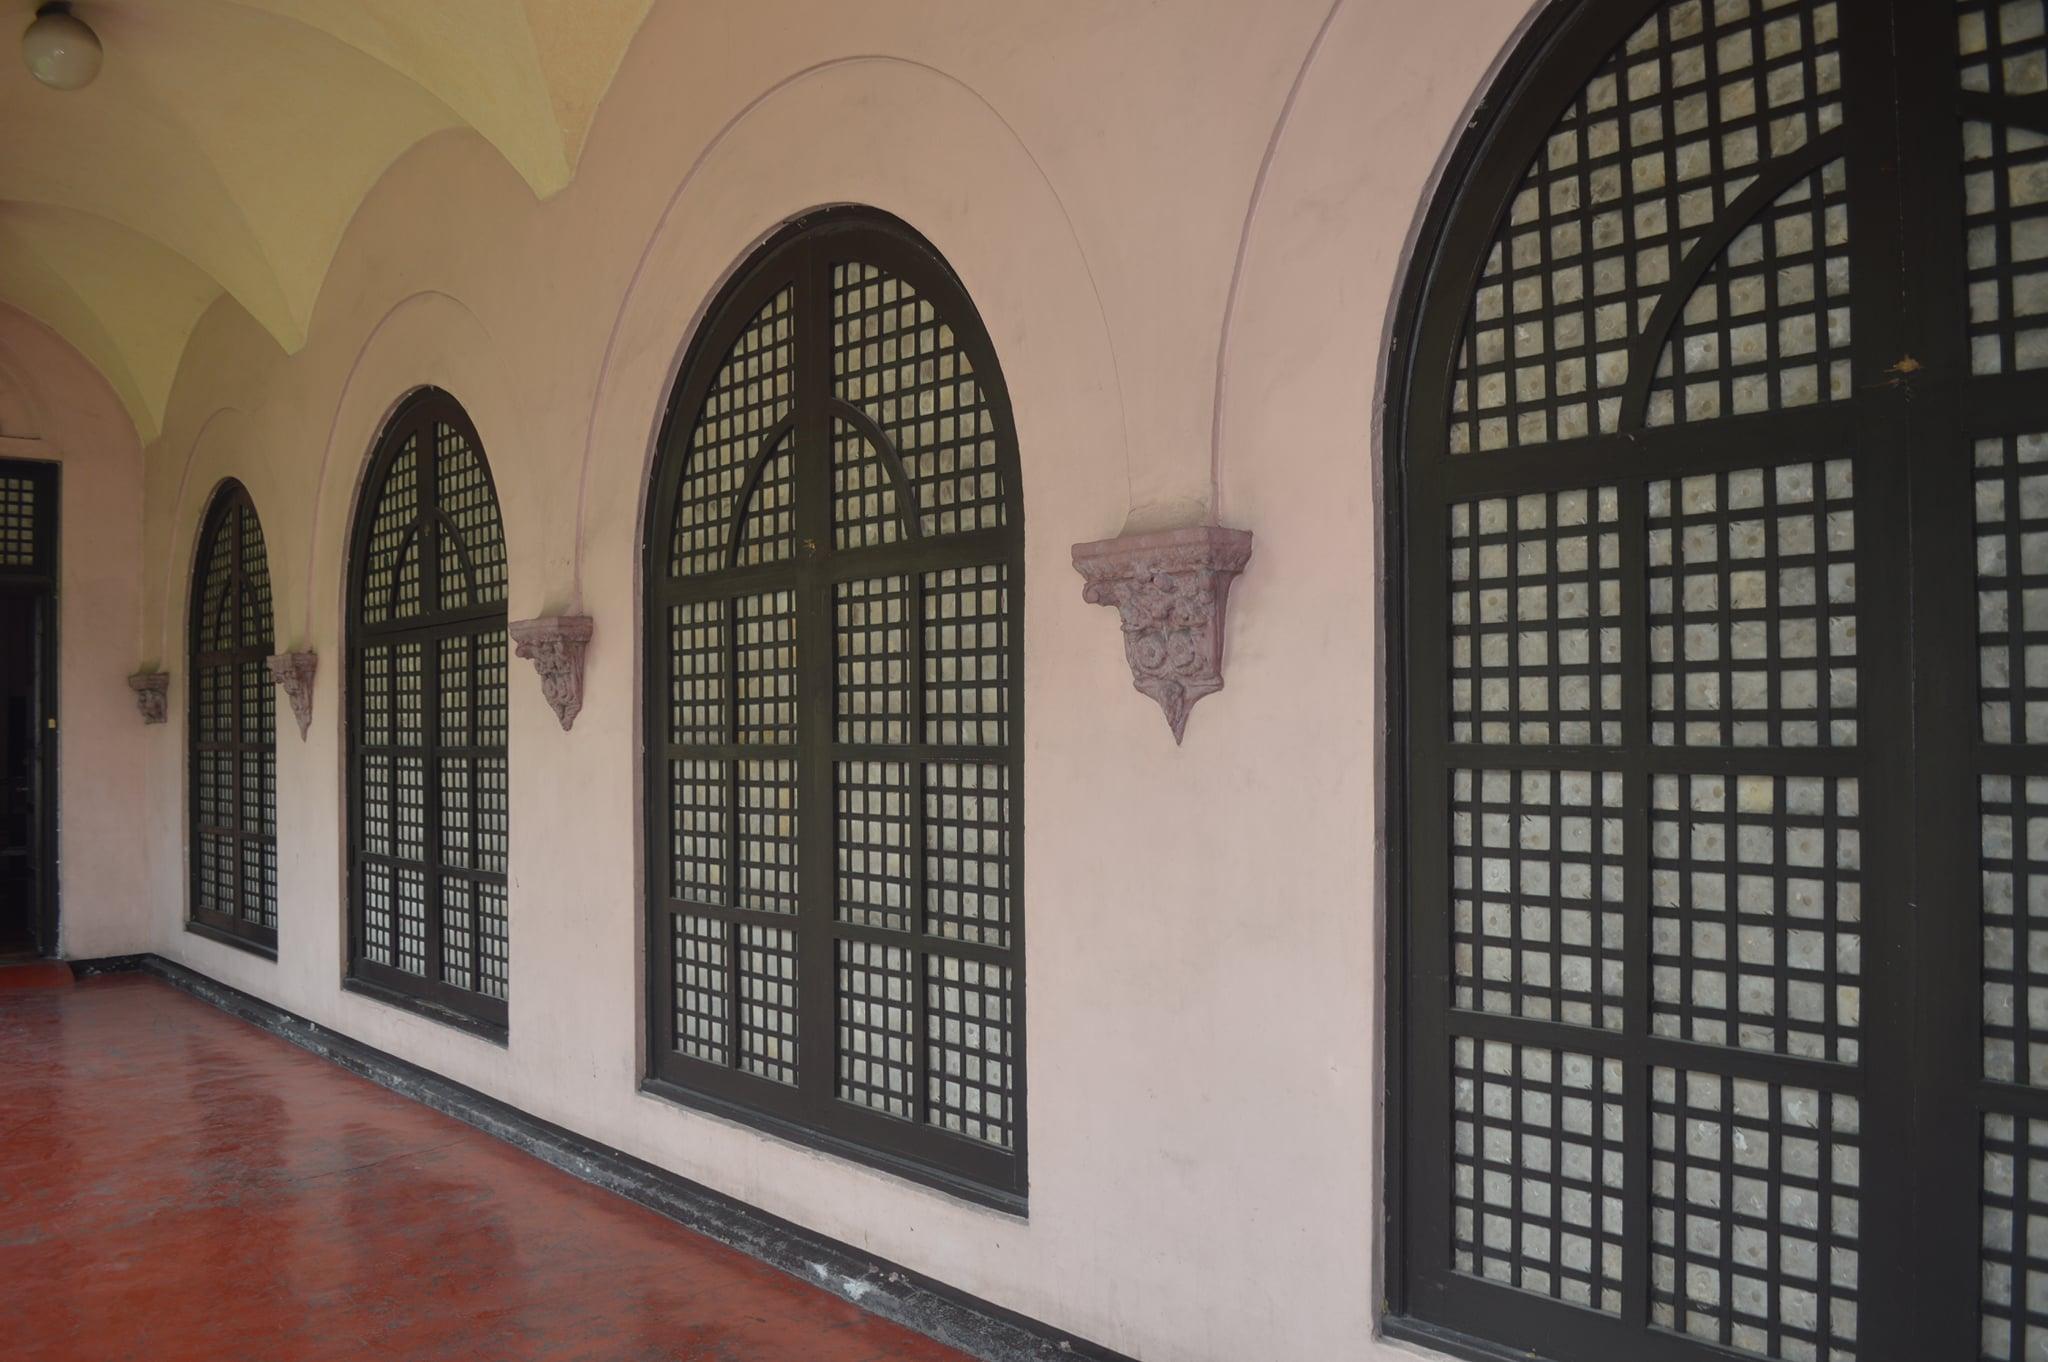 Gota de Leche's extant capis windows